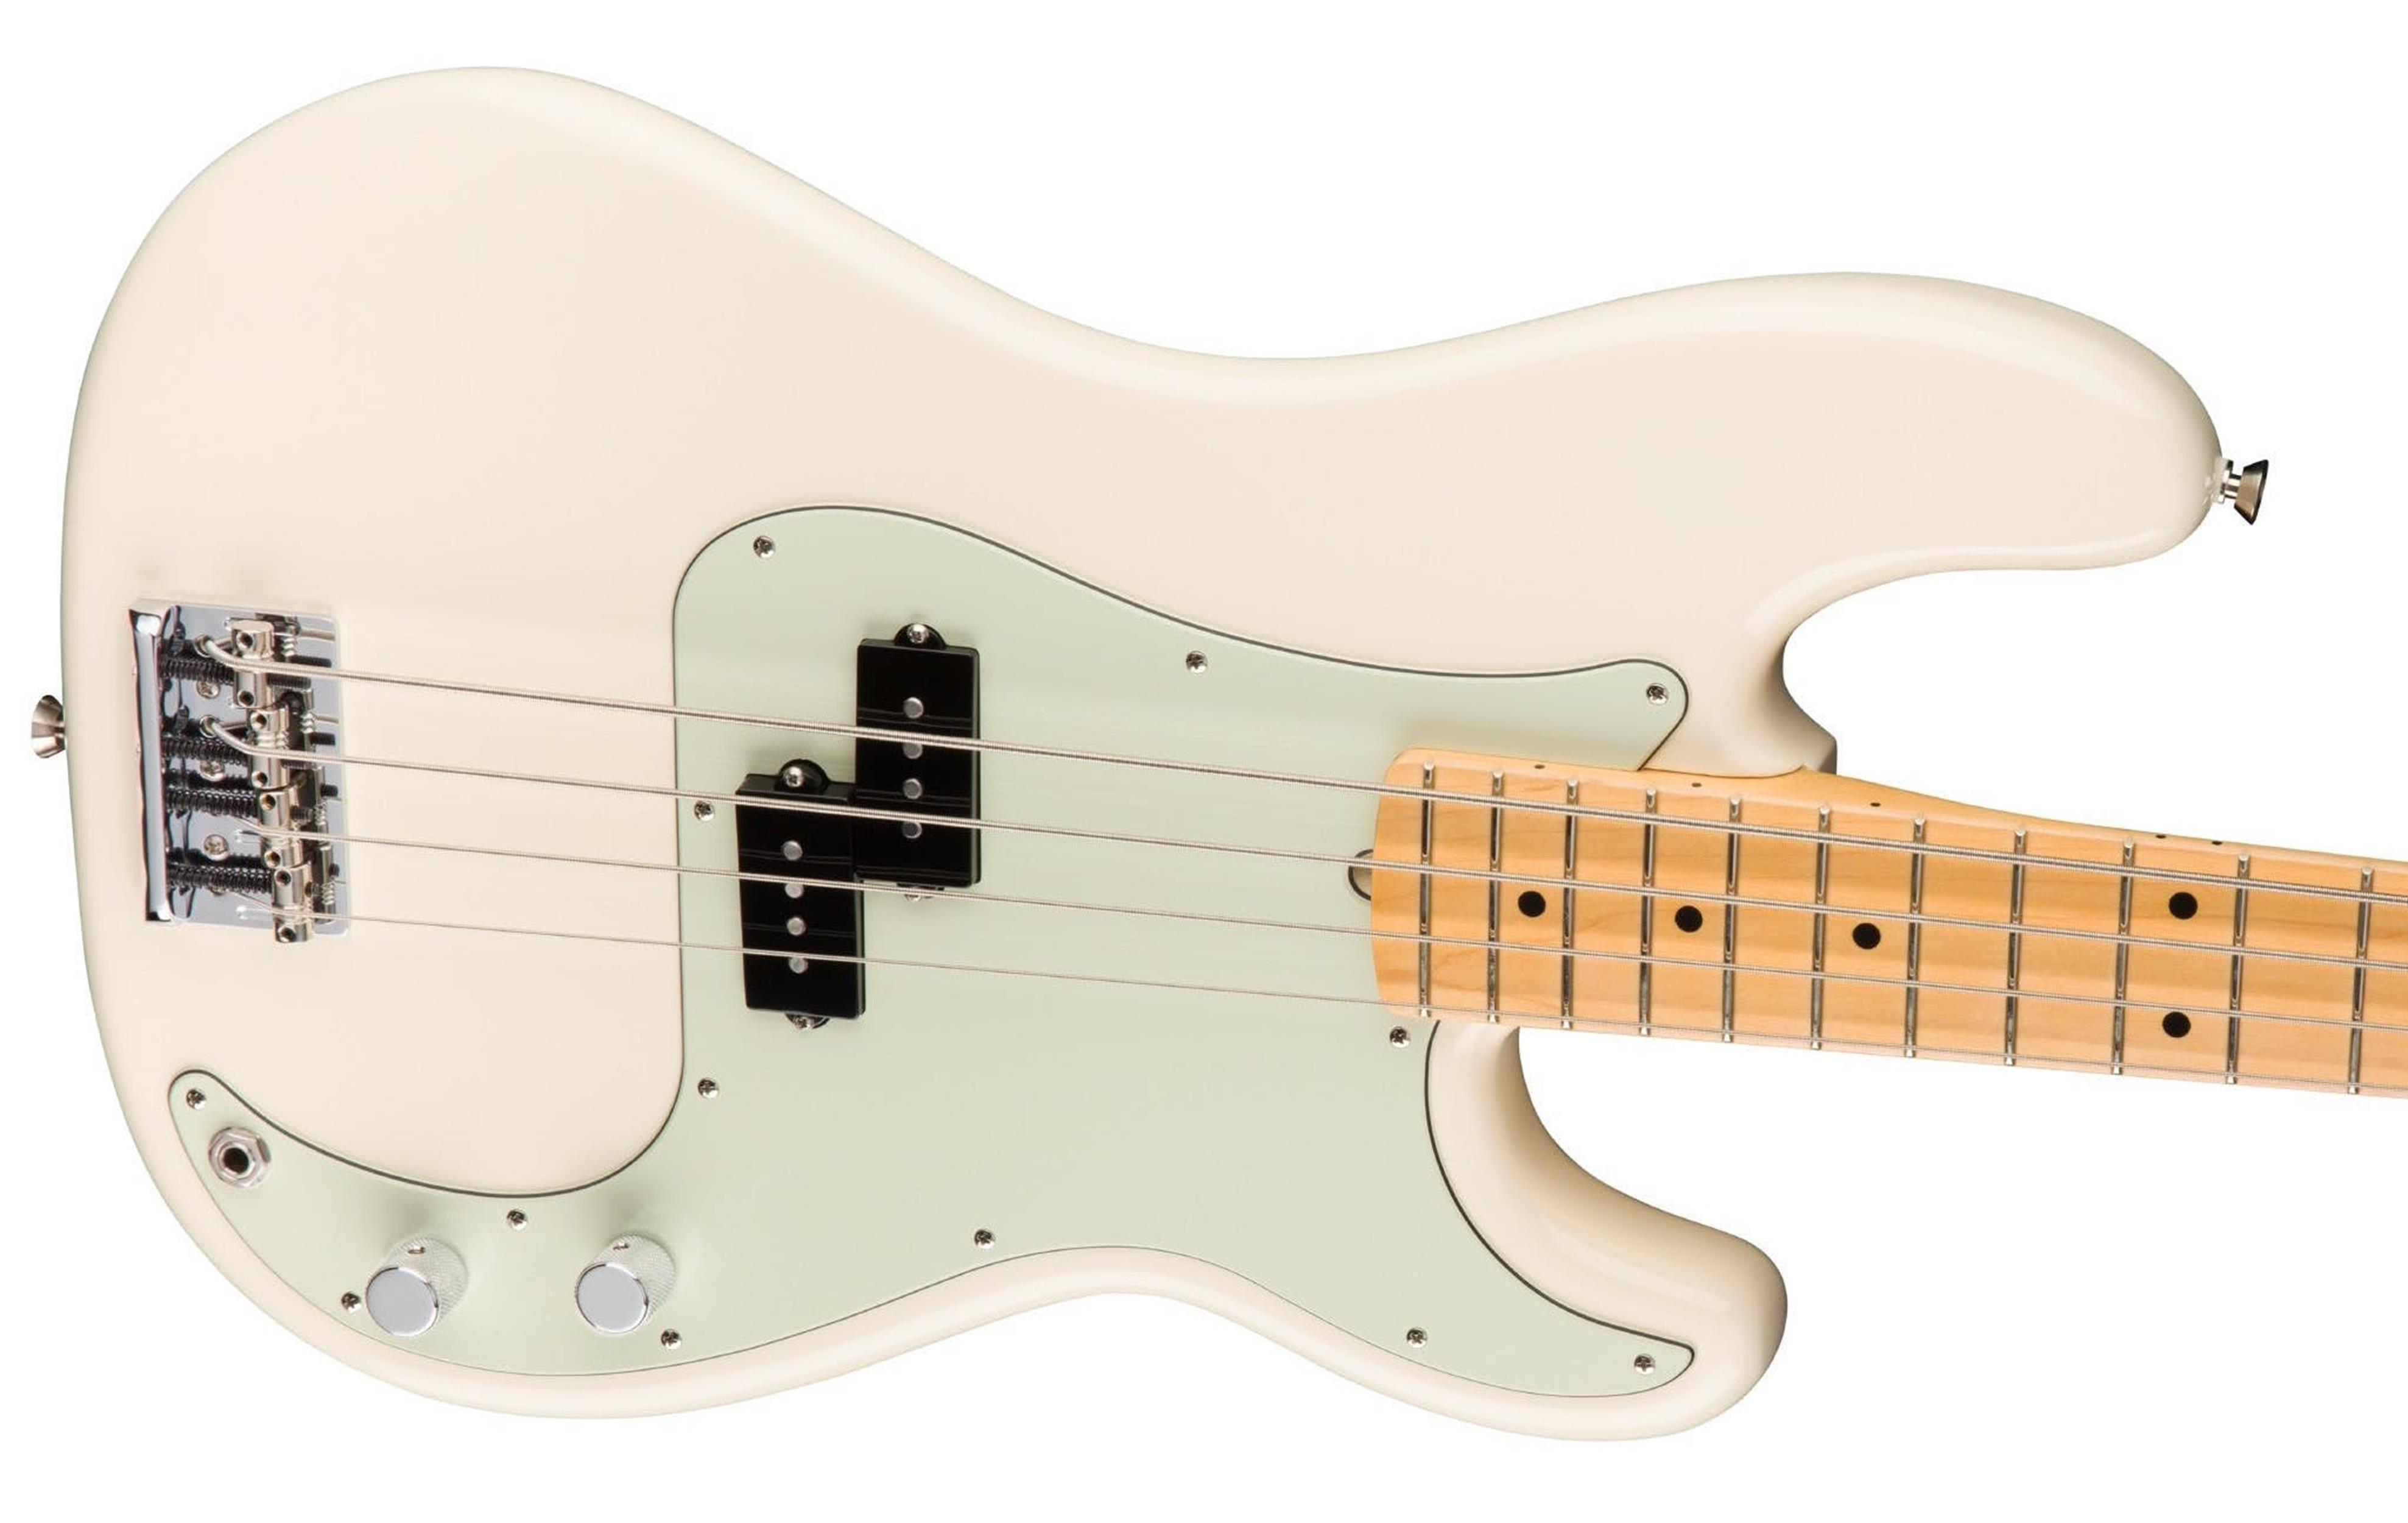 FENDER American Pro Professional Precision Bass MN Olympic White 0193612705  0193612705 - Bassi Bassi - Elettrici 4 Corde